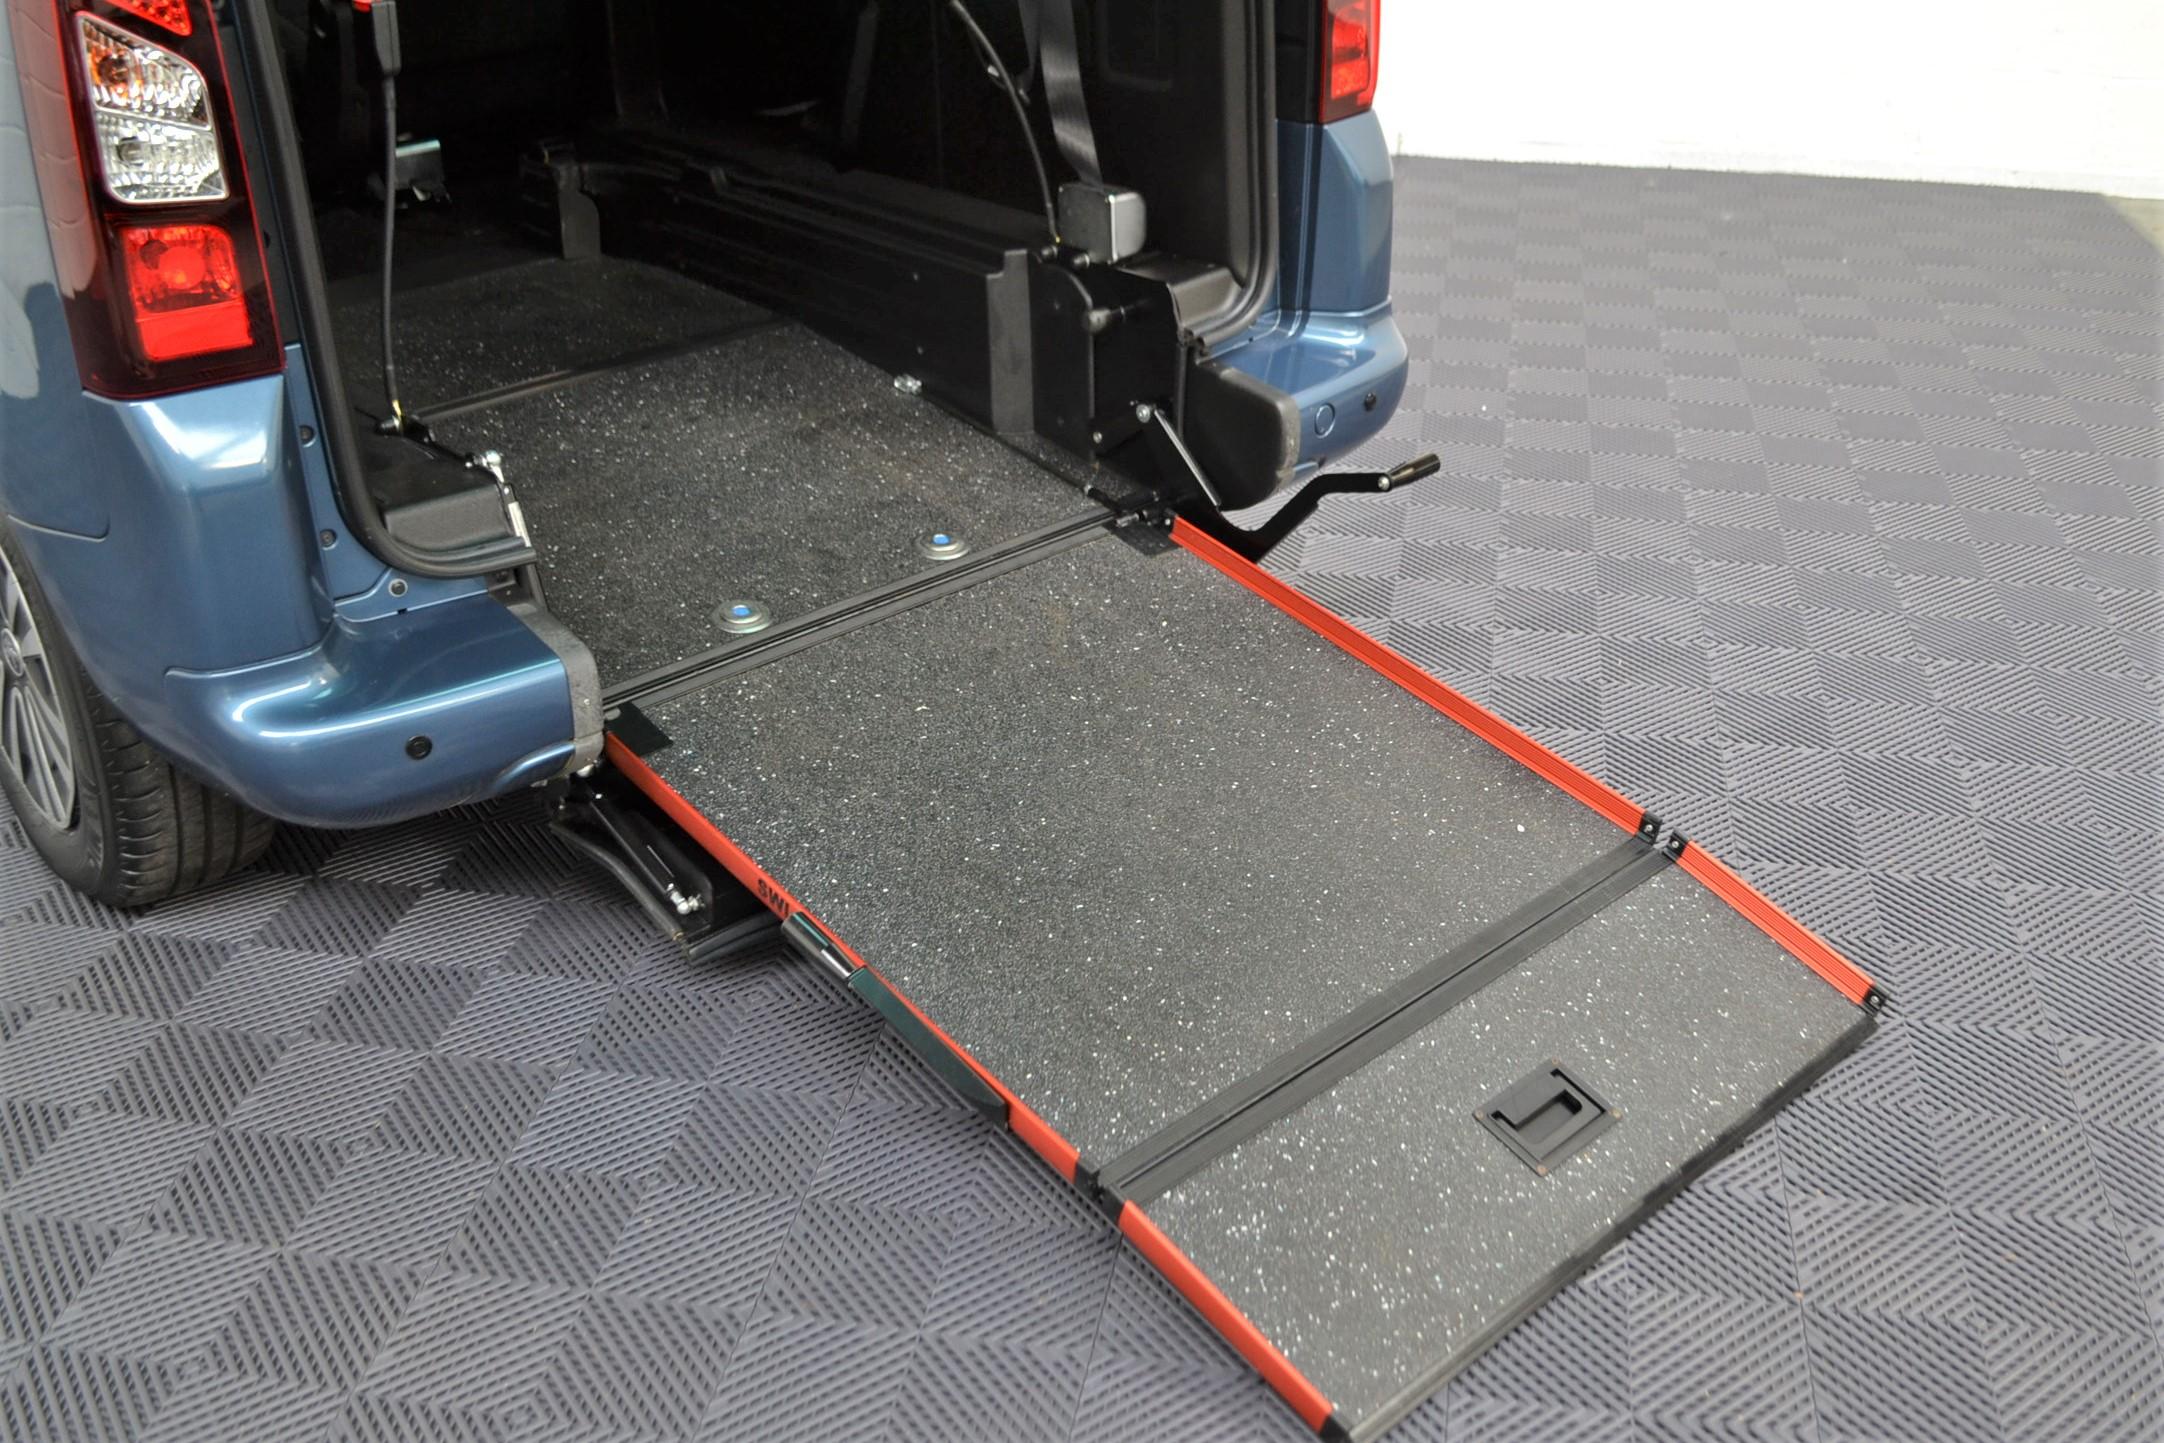 WAV Cars For Sale Bristol Wheelchair Accessible Vehicles Used For Sale Somerset Devon Dorset Bath Peugeot Partner SF67 EEA 4